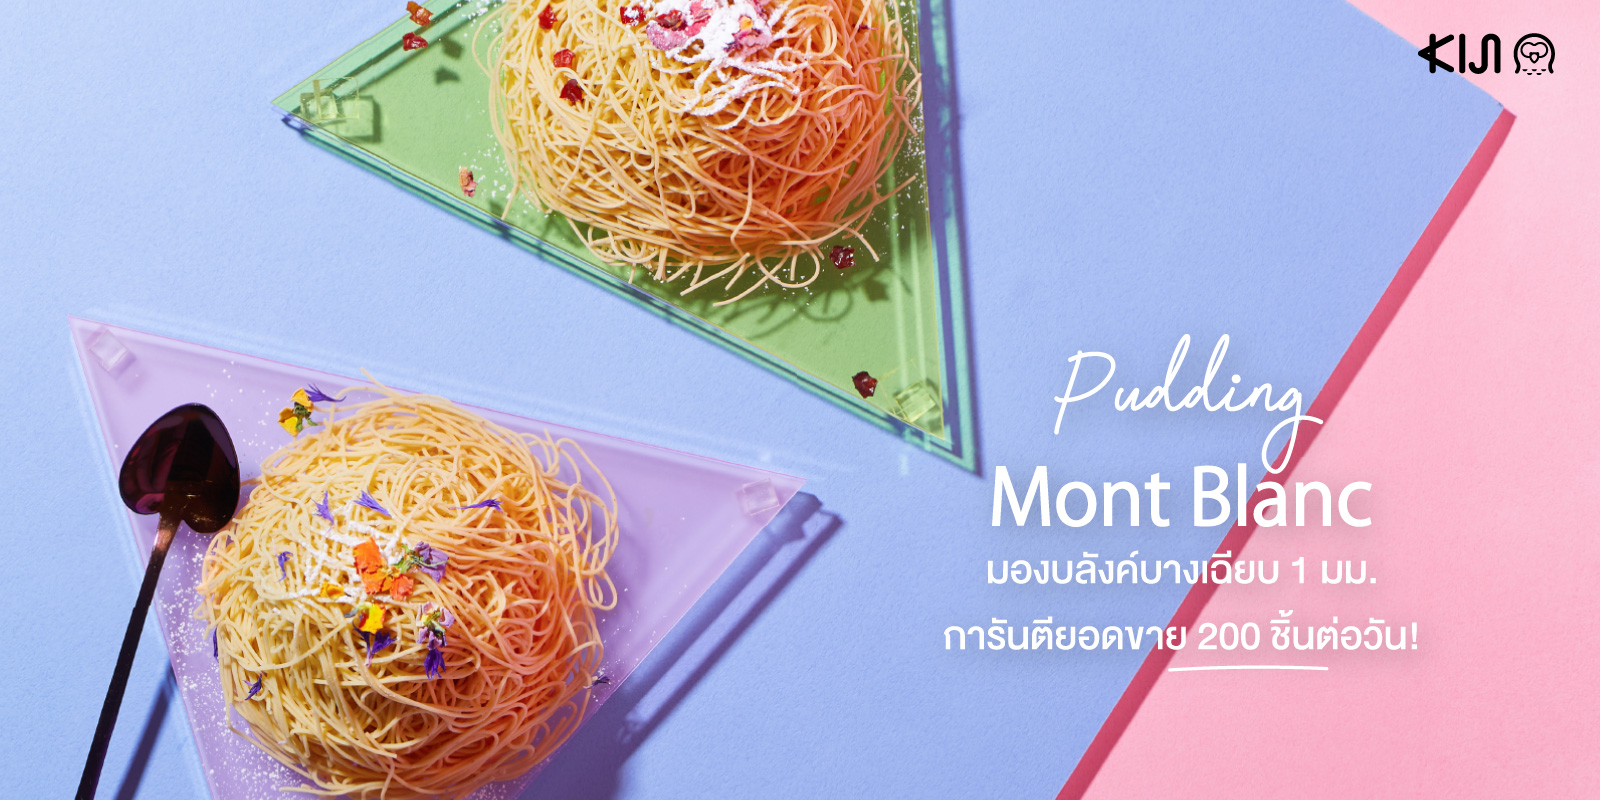 Pudding Mont Blanc เมนูขายดีประจำคาเฟ่ Bread Wine & Sanya การันตียอดขาย 200 ชิ้นต่อวัน!